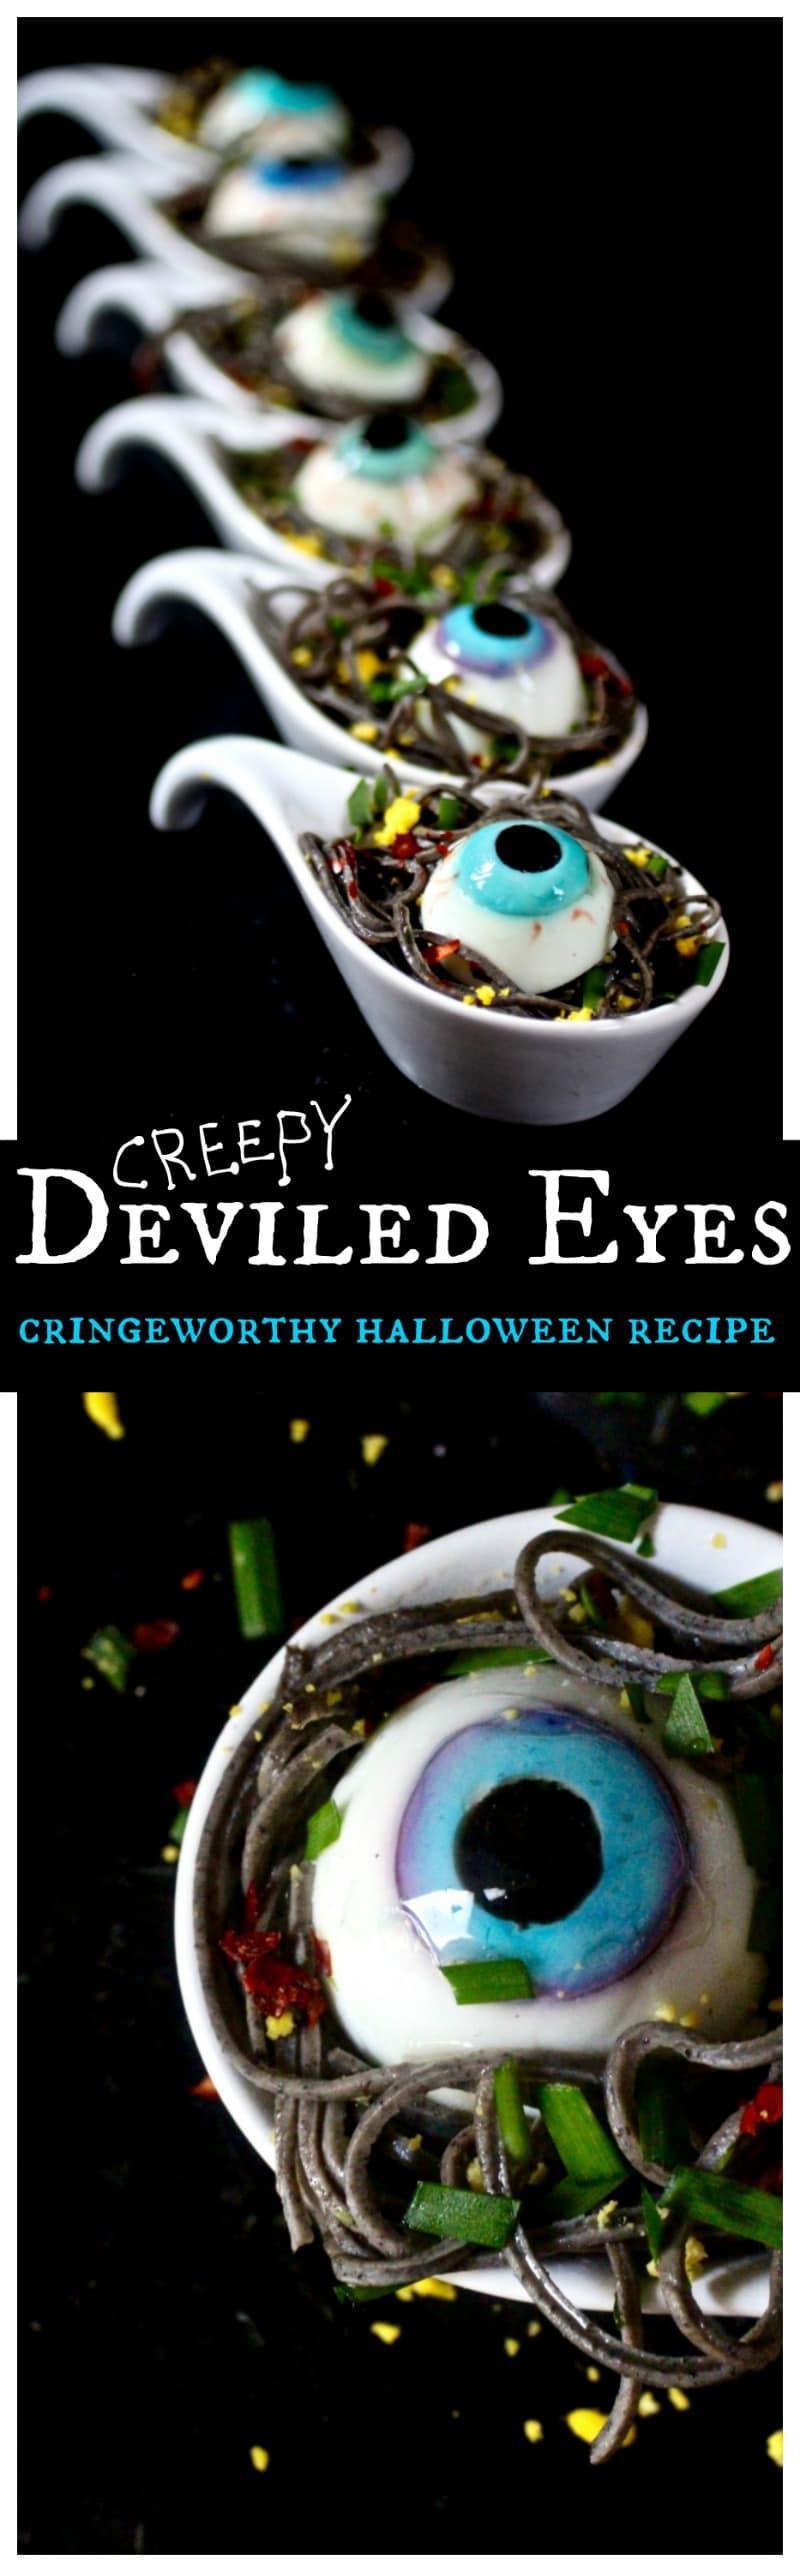 deviled-eyes-recipe